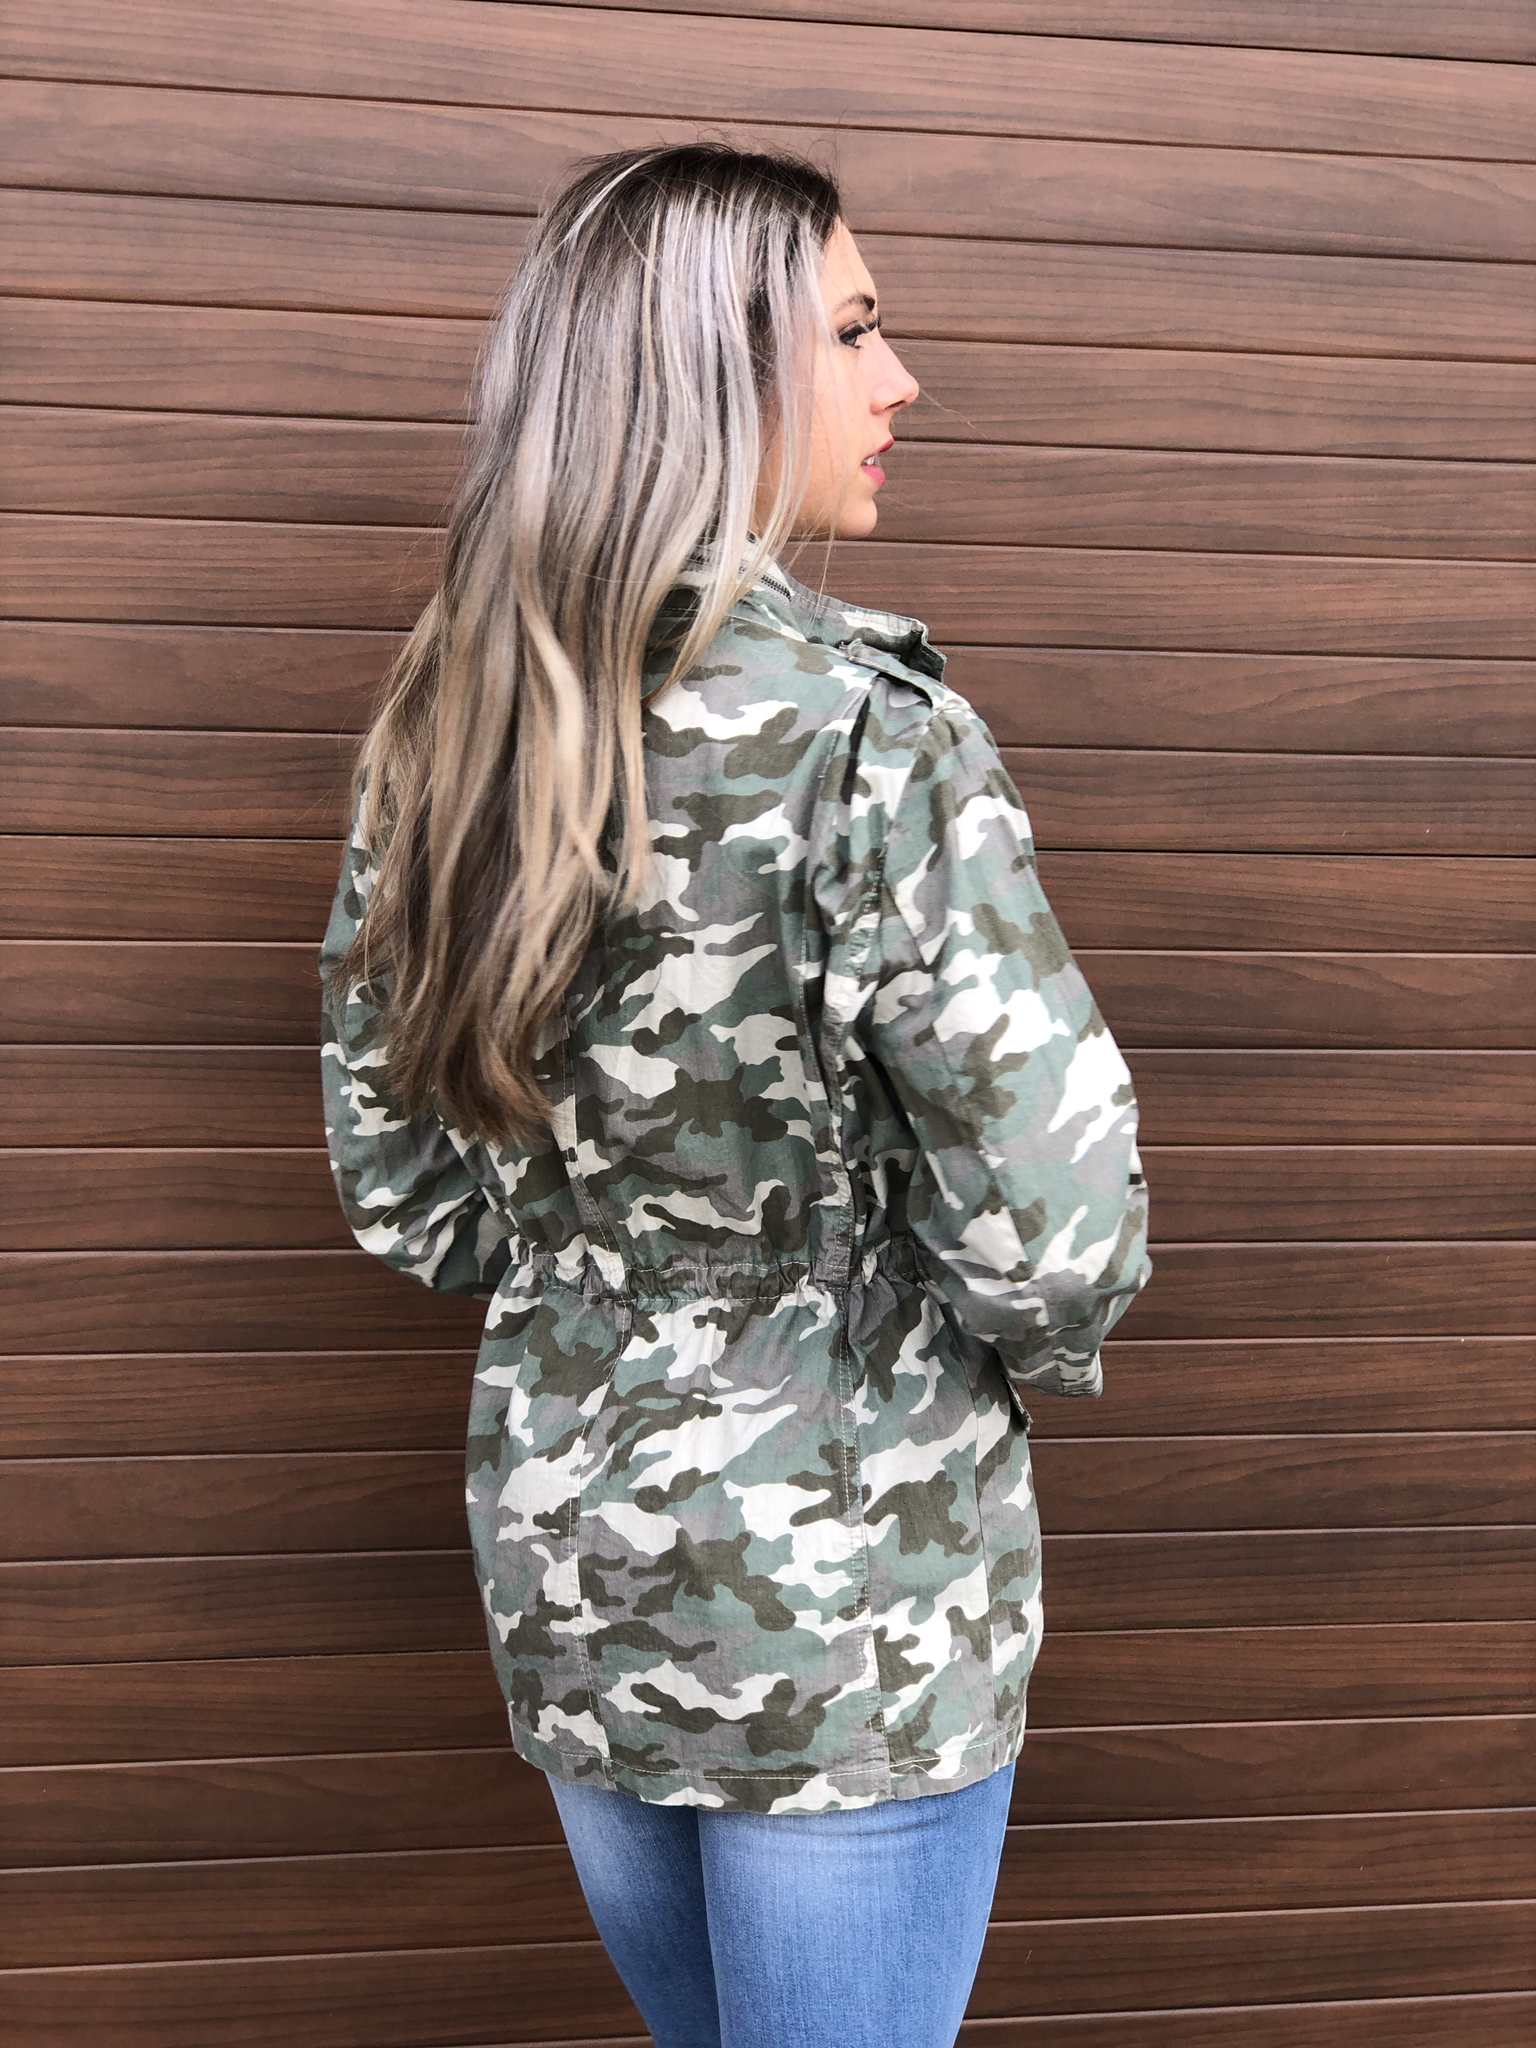 Spring Camo shell Jacket 82234